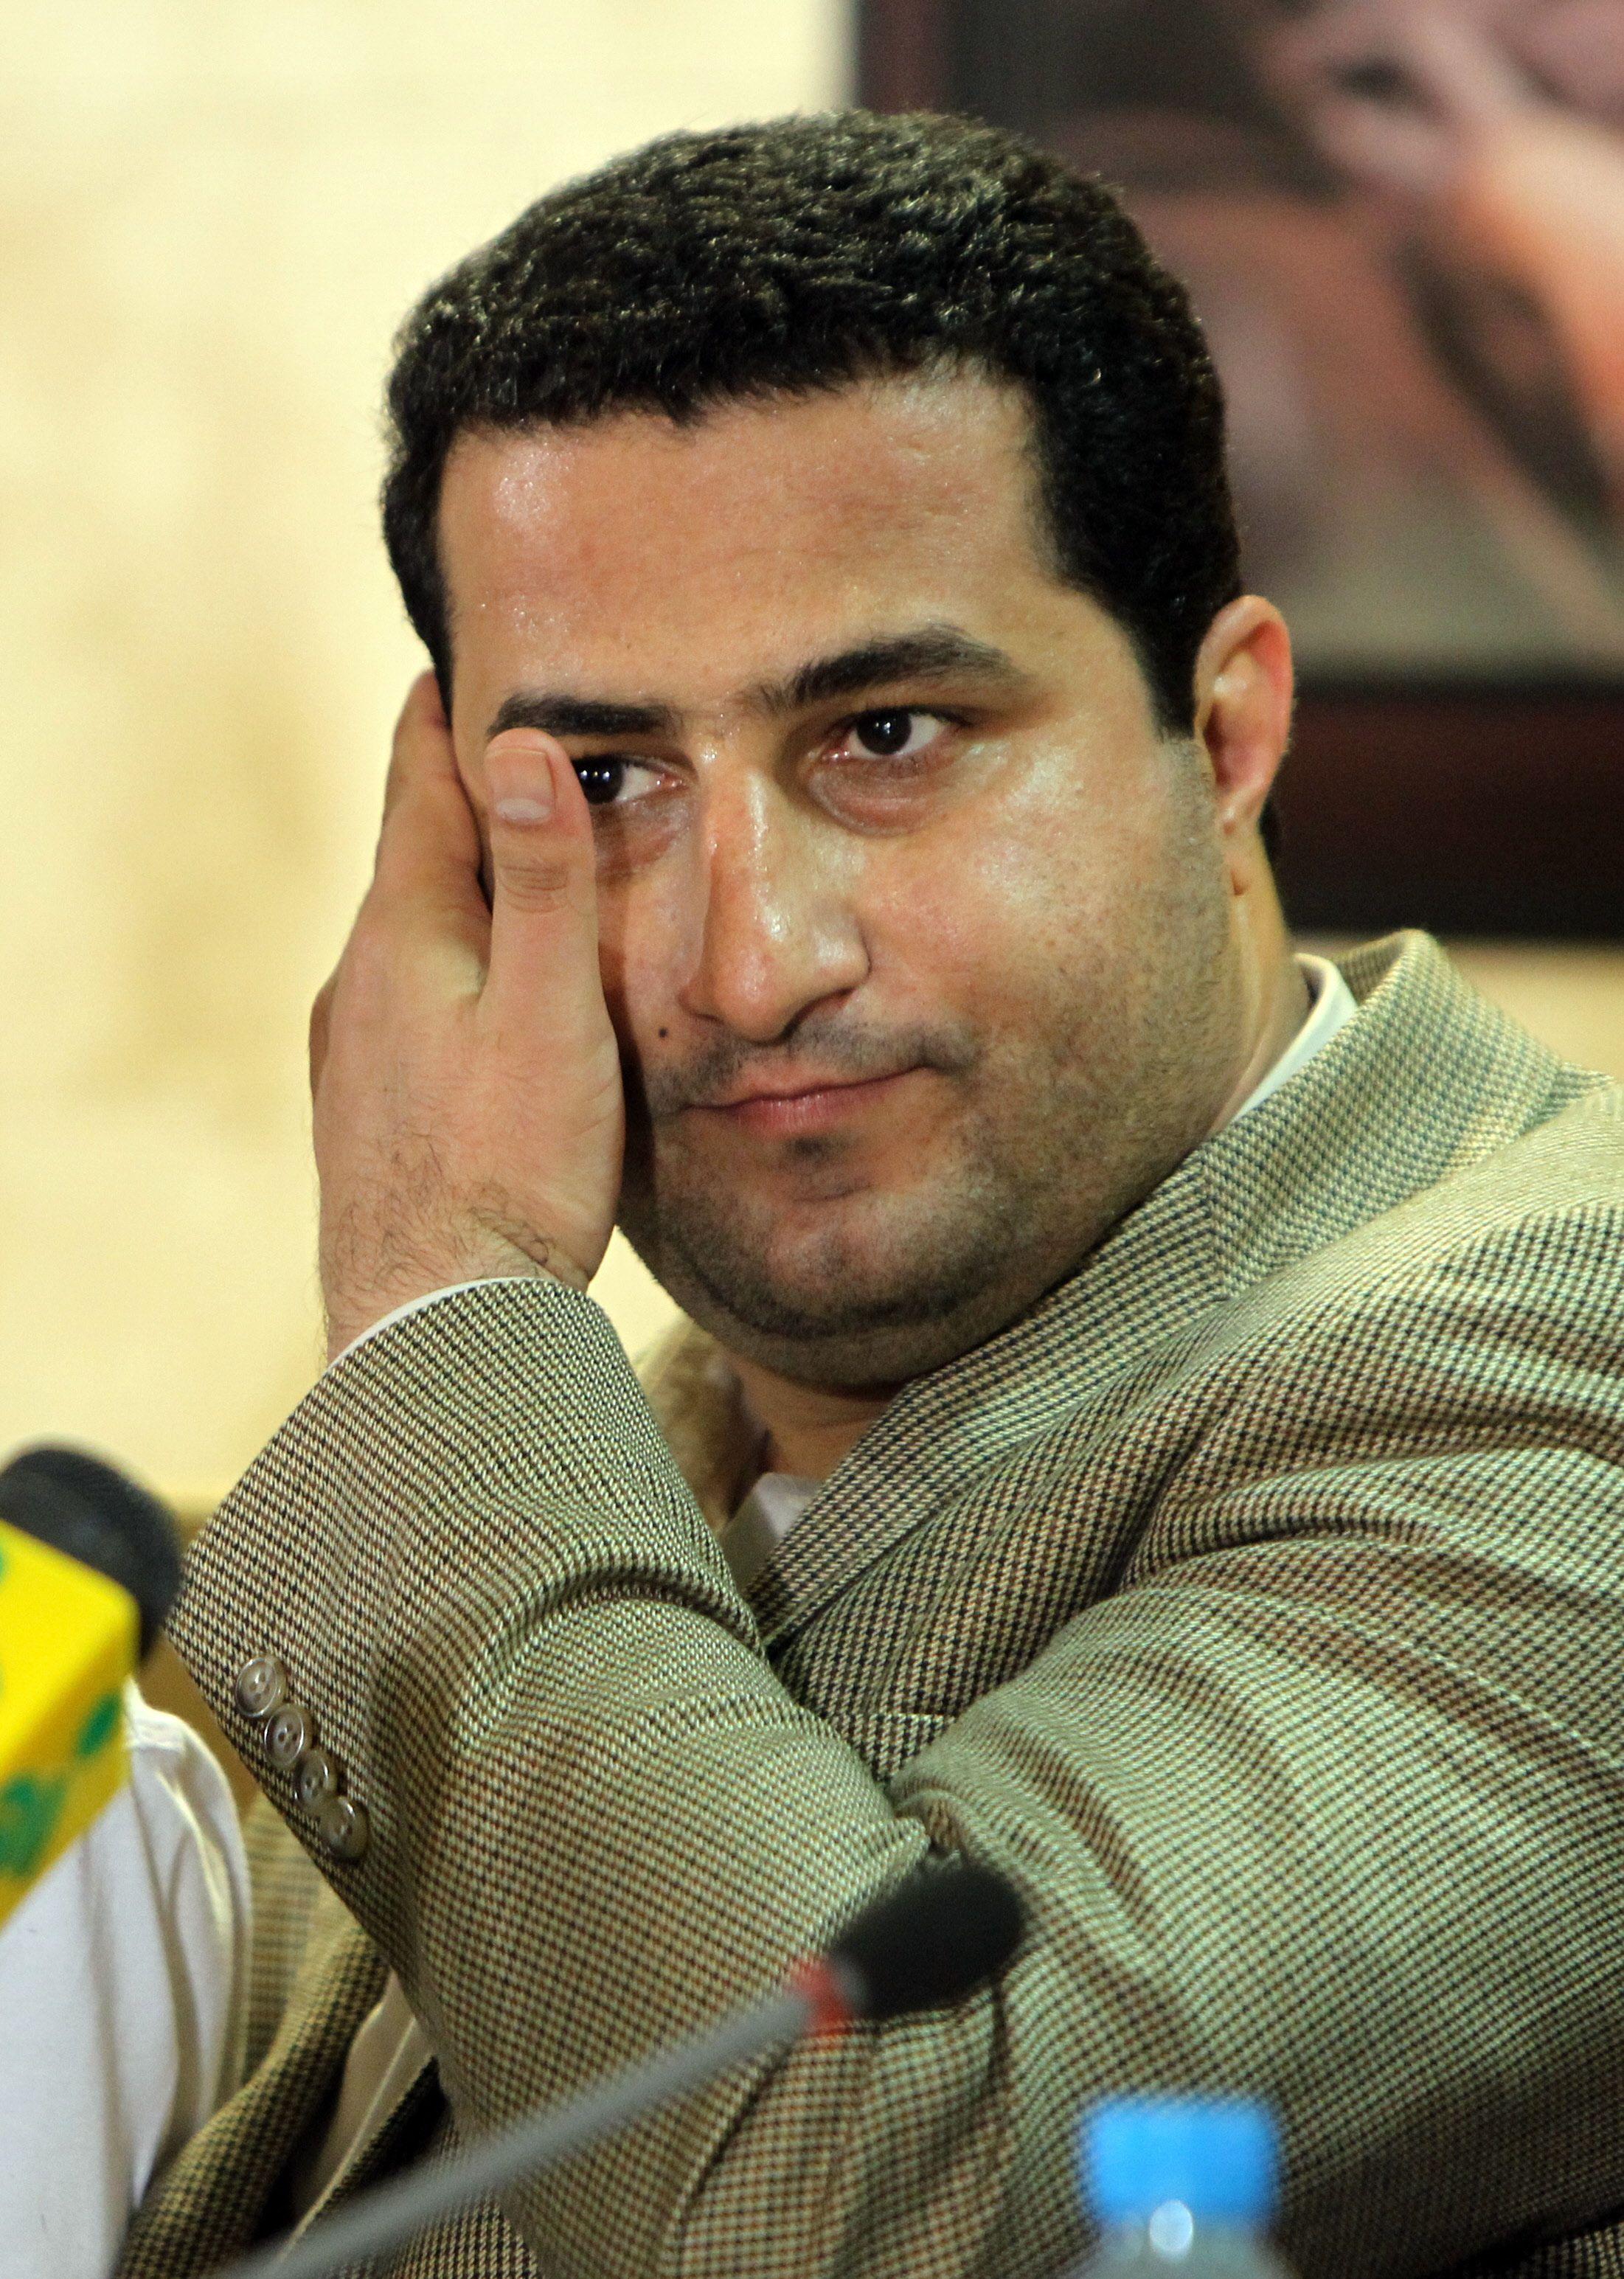 Irán ejecutó a un científico nuclear acusado de espiar para Estados Unidos